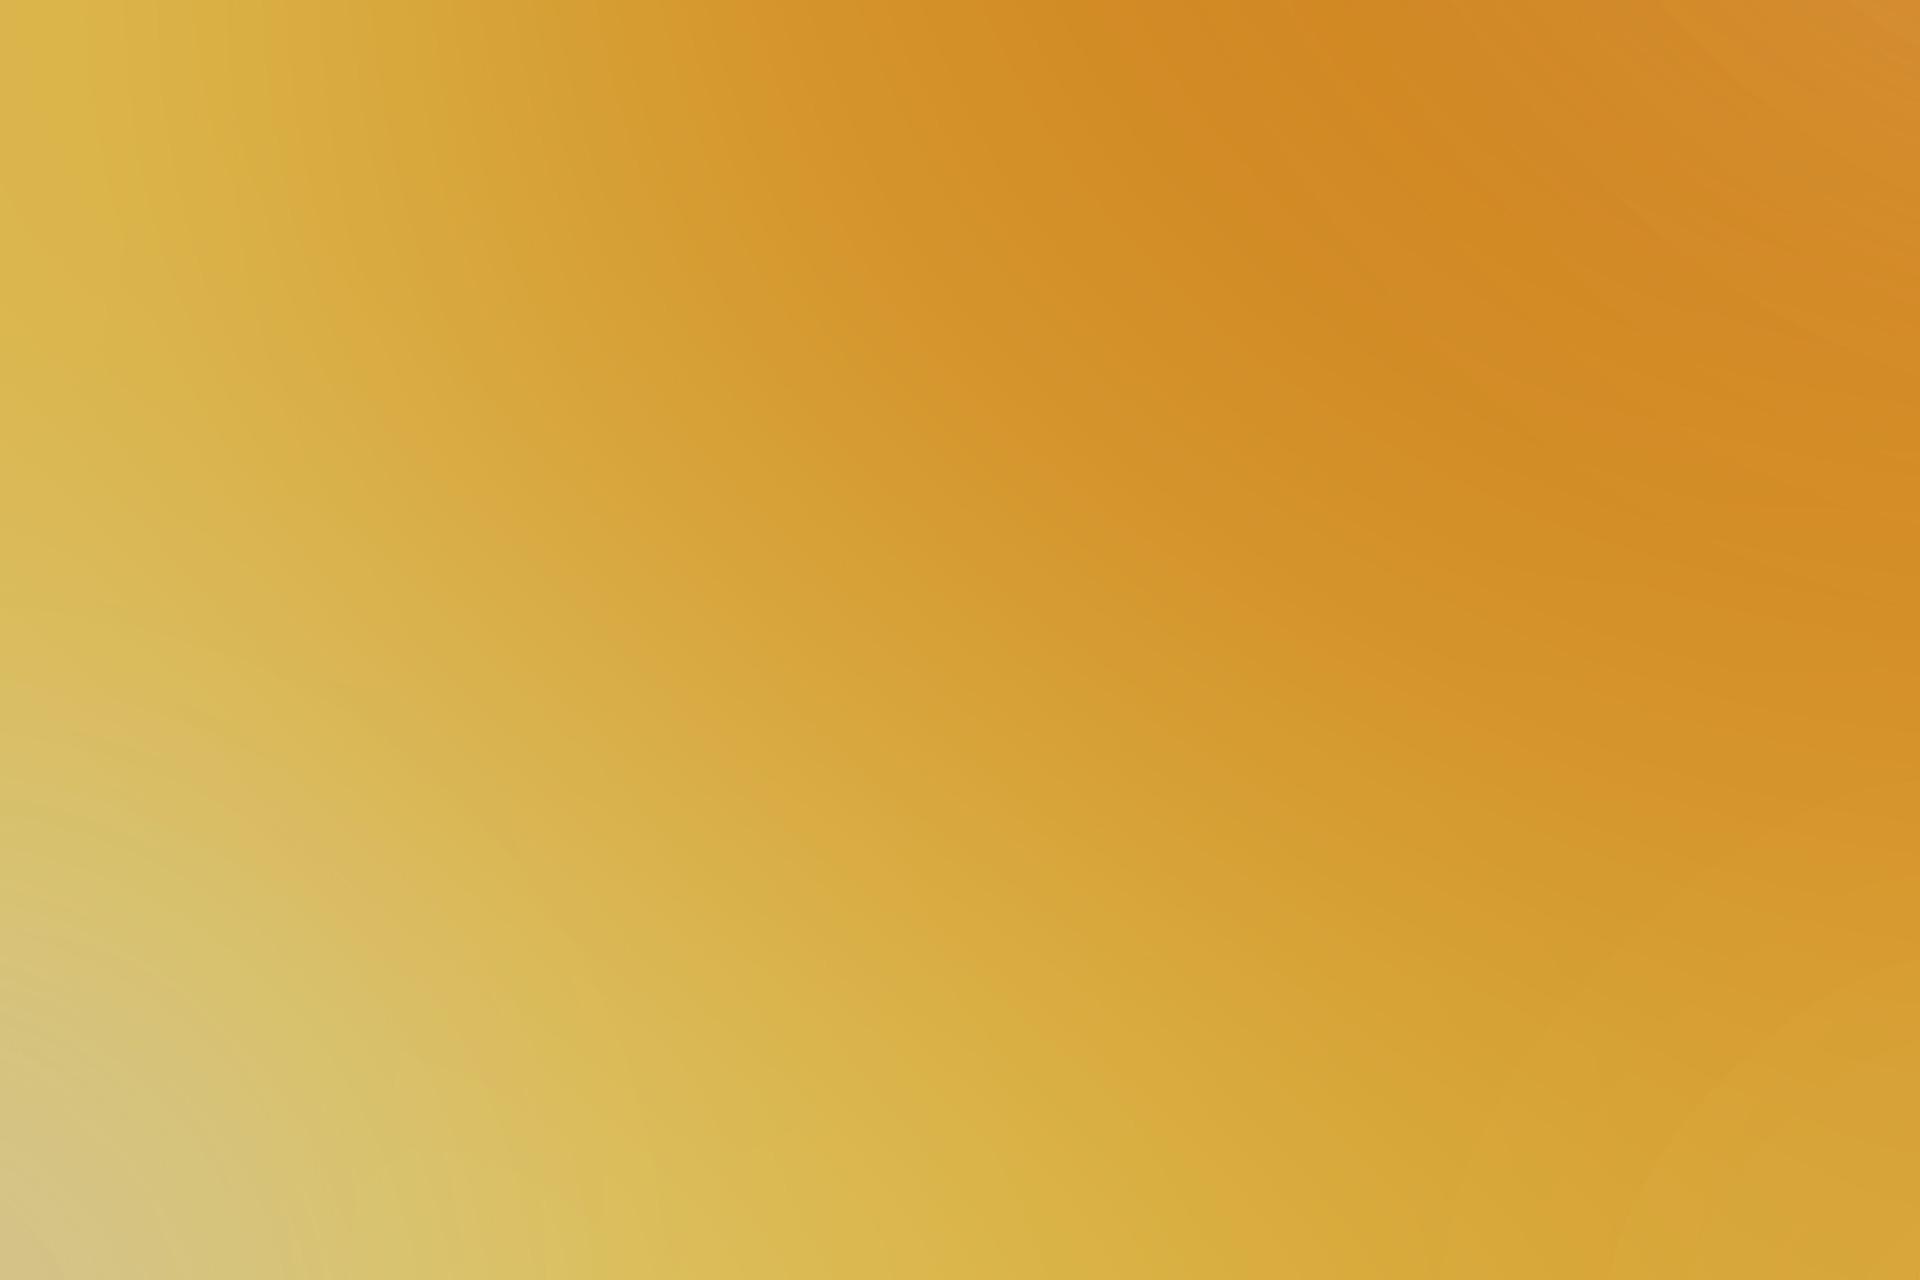 gold-1188347_1920.jpg